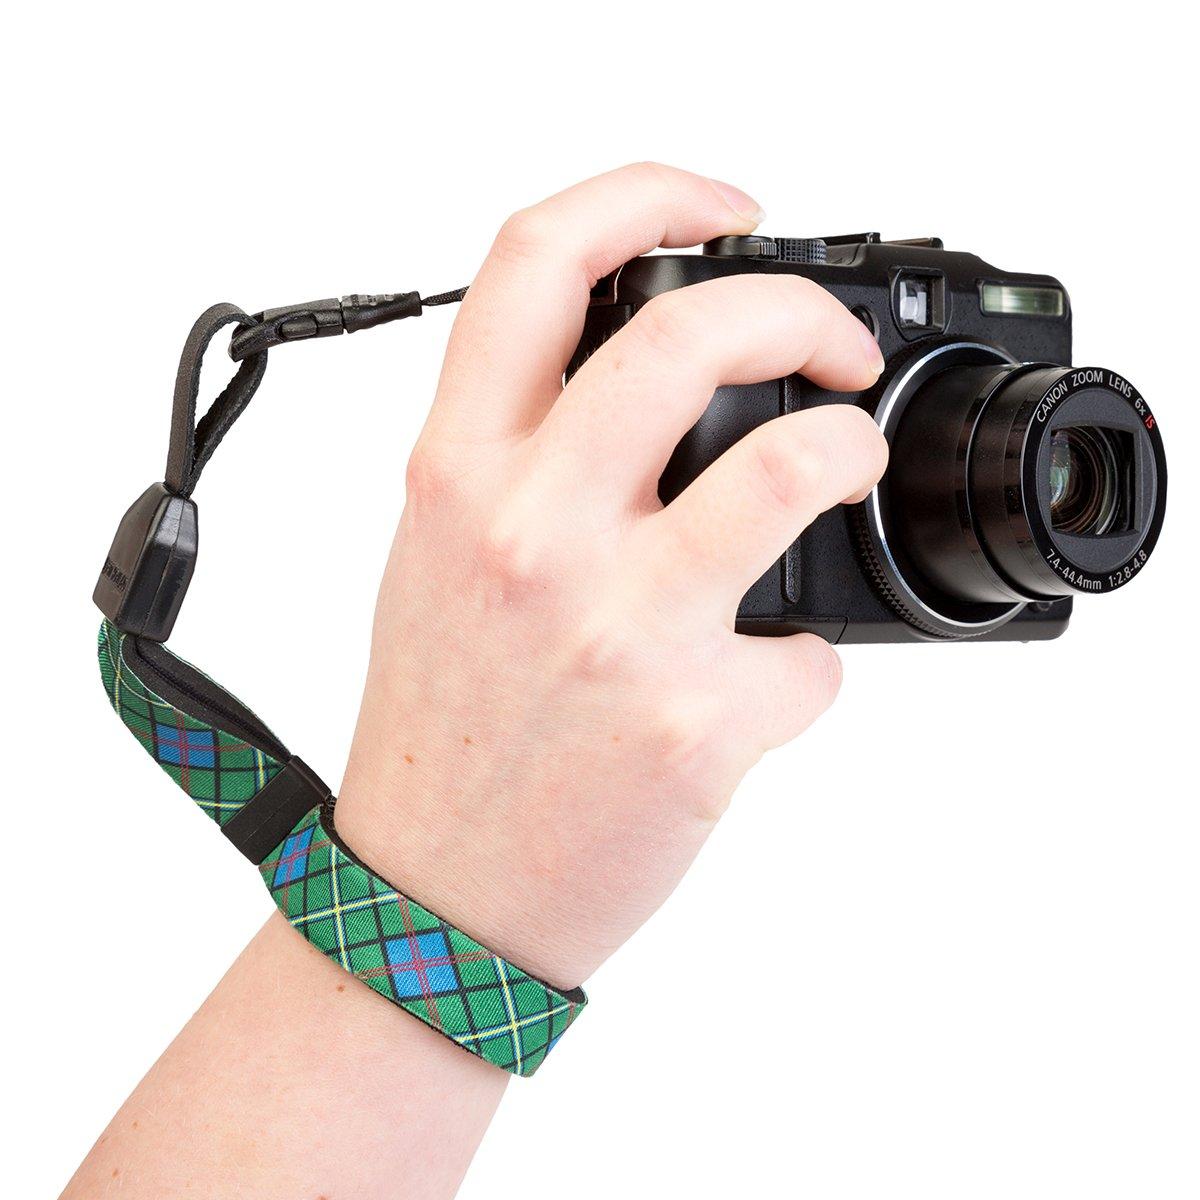 OP/TECH USA Cam Strap-QD (Black) 1801021